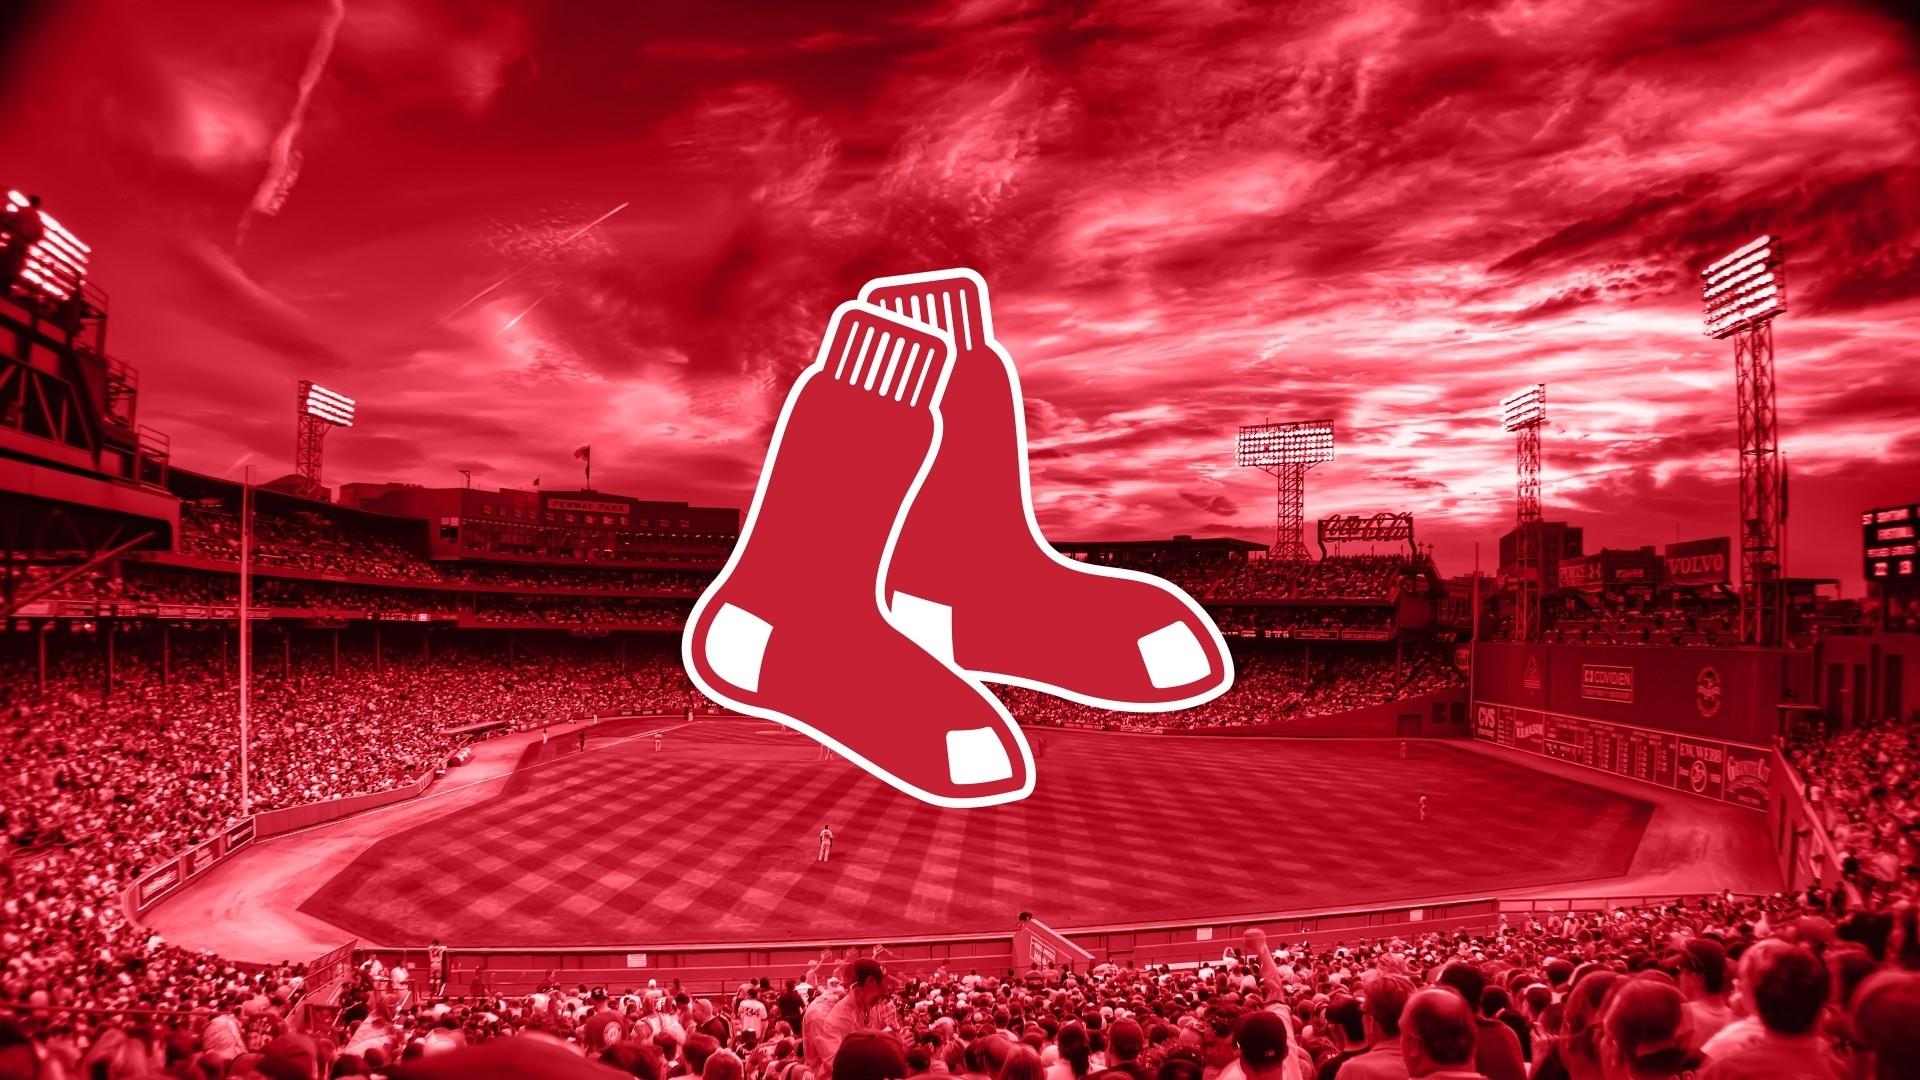 Red Sox Wallpaper image hd